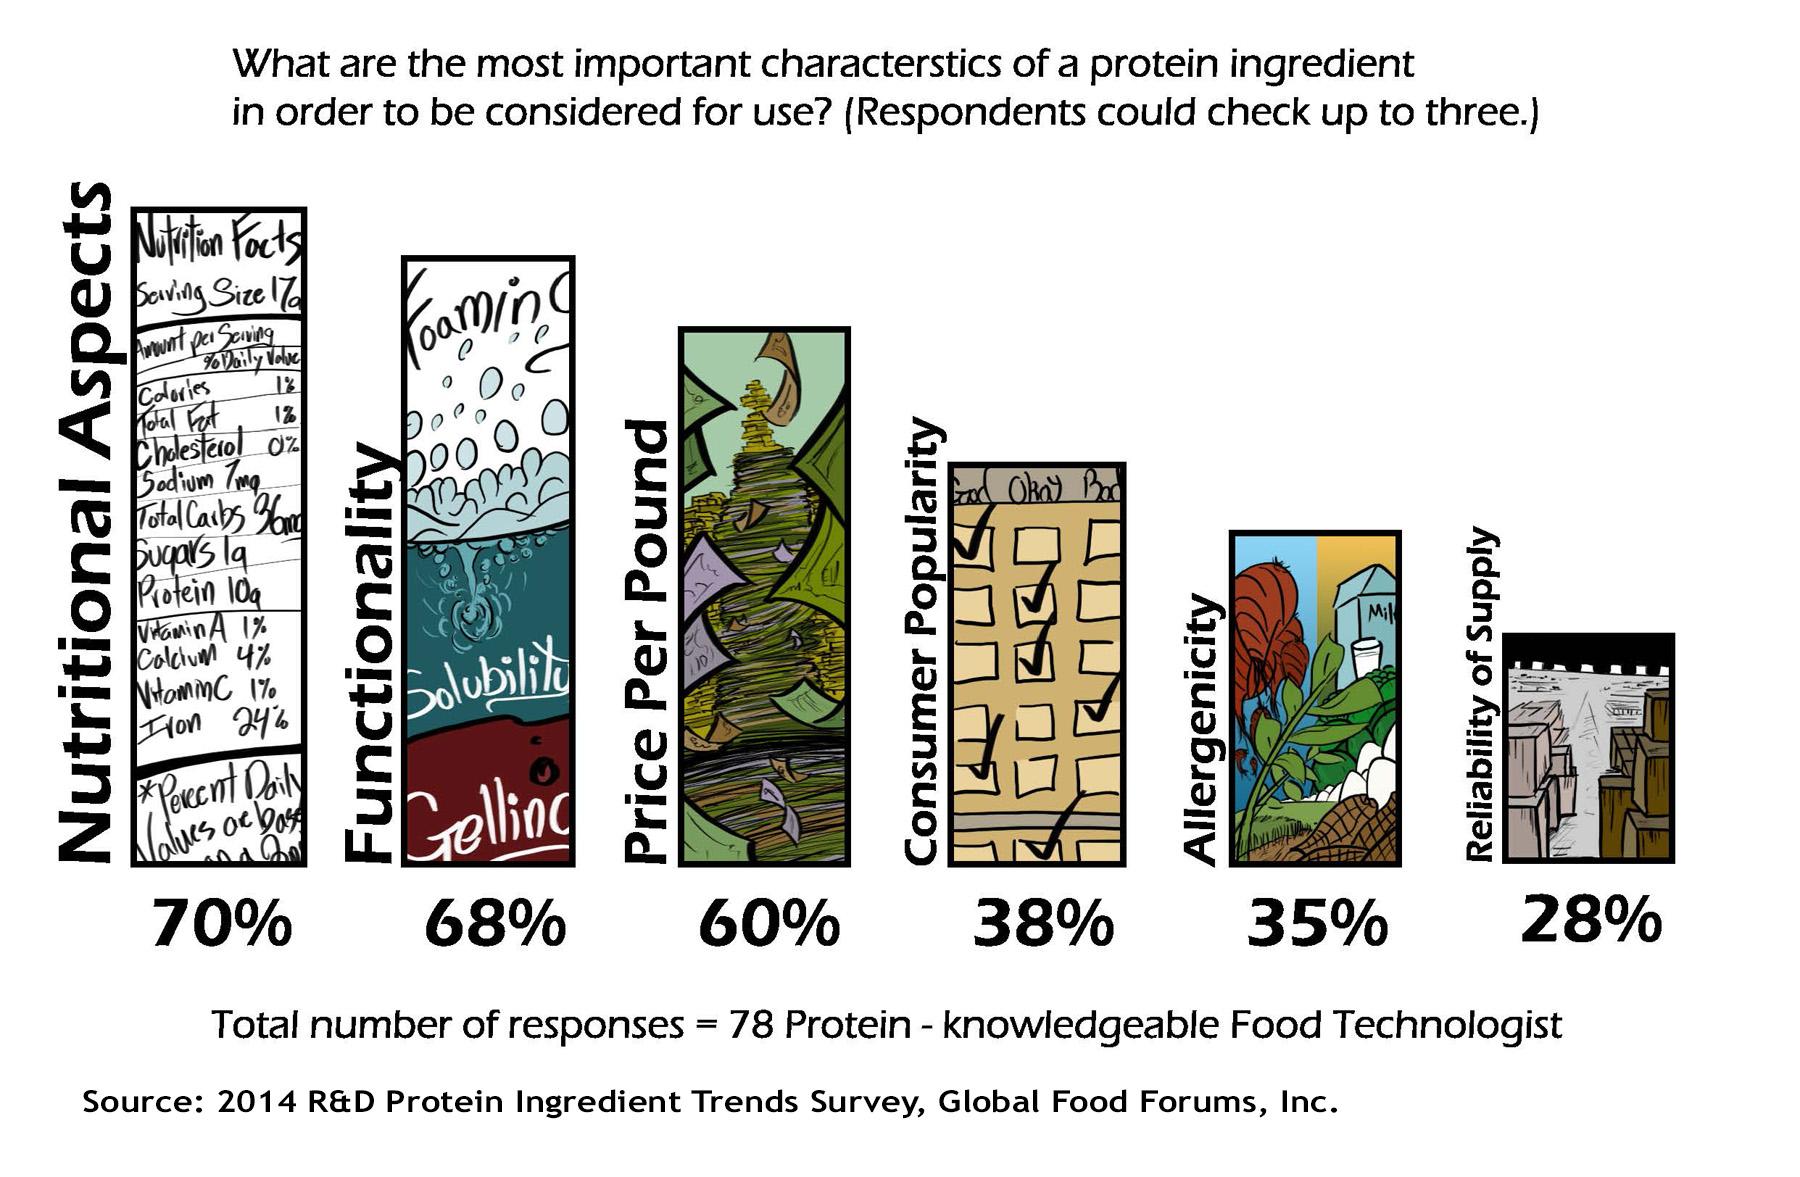 Most Important Ingredient Characteristics